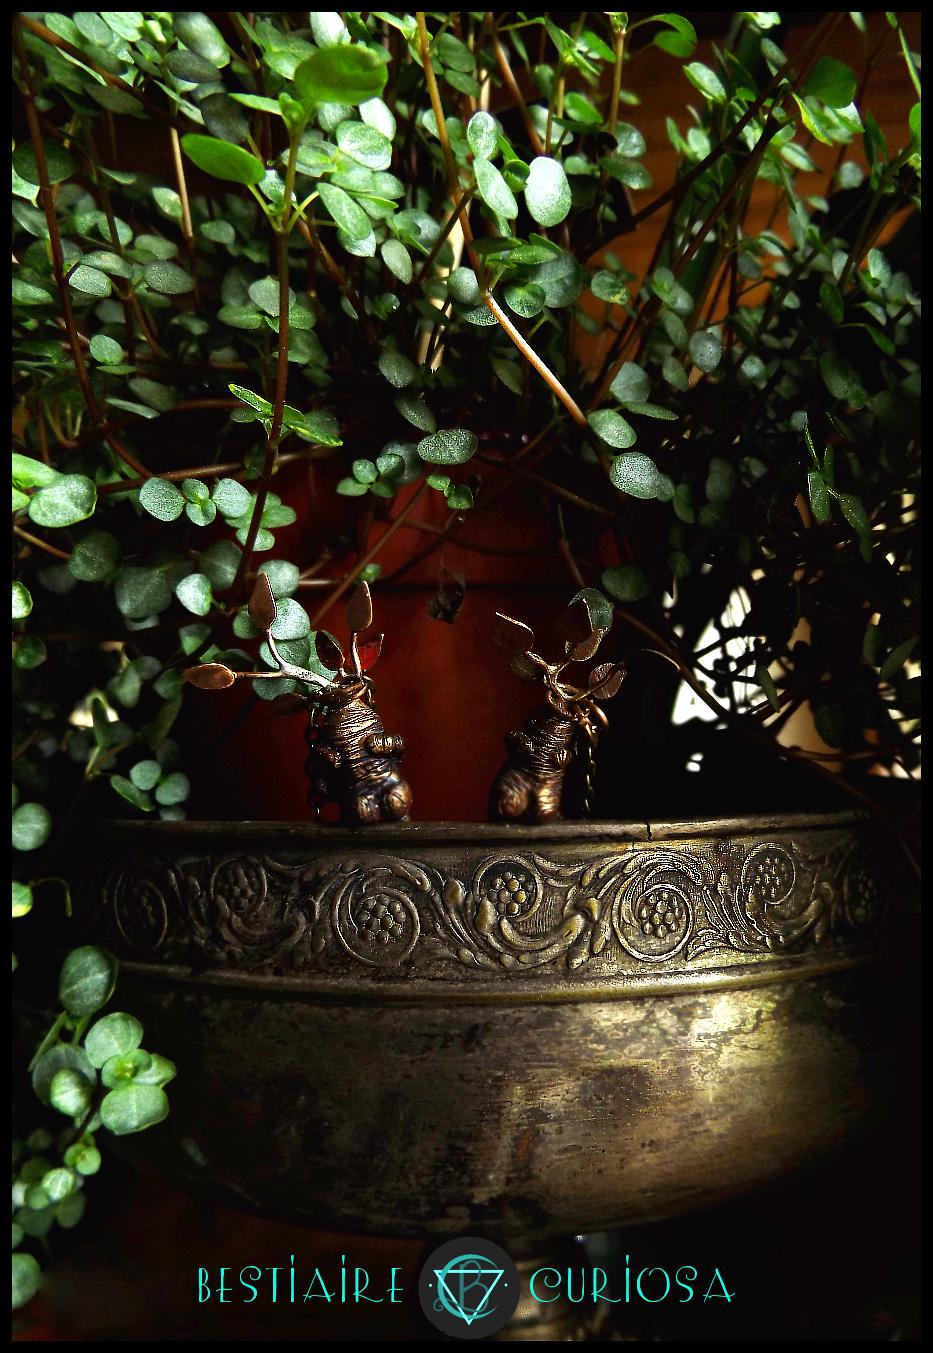 locket boîte secret box goth gothic wicca witchy poudlard hogwarts bestiaire curiosa harry potter newt scamander hermione animaux fantastiques fantastic beasts occult mystic mysterious albus dumbledore caput draconis bijou d'auteur bijou d'art cottage core cottagecore witch labradorite crystal tarot esoterisme white magic magie blanche altar autel grimoire spellbook mandragore mandrake root herbologie herbology